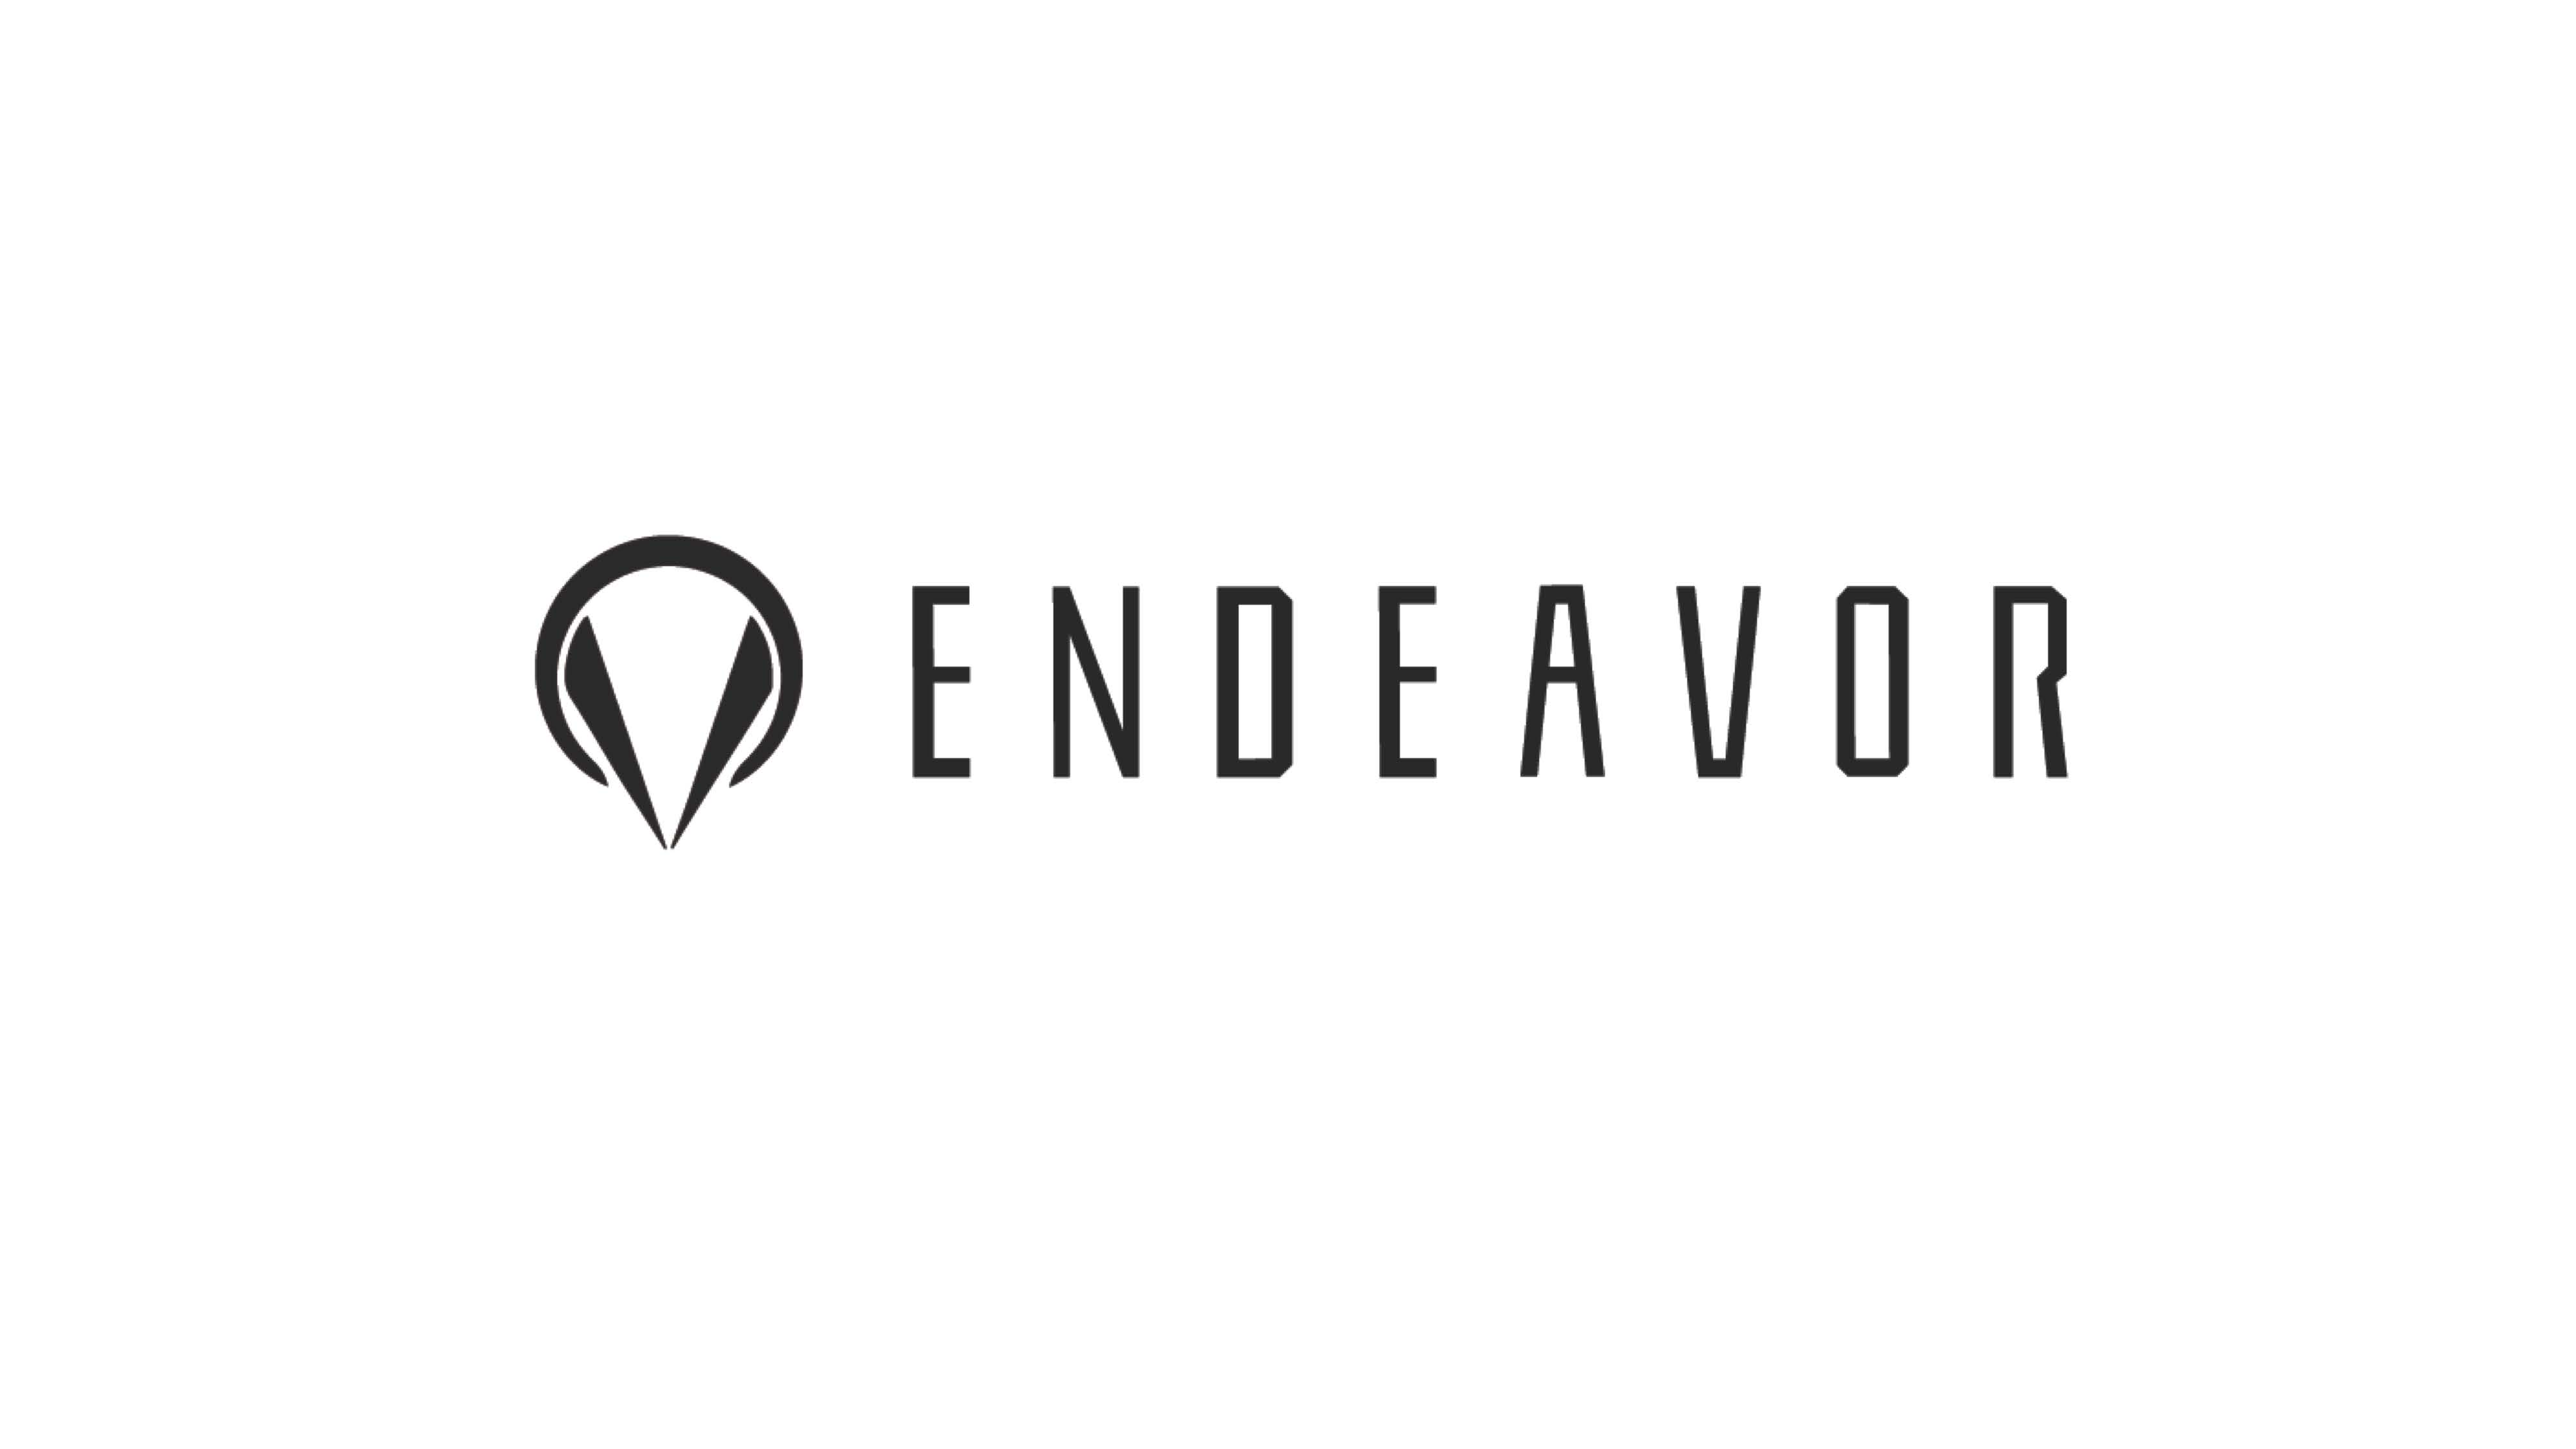 endeavor_03.jpg